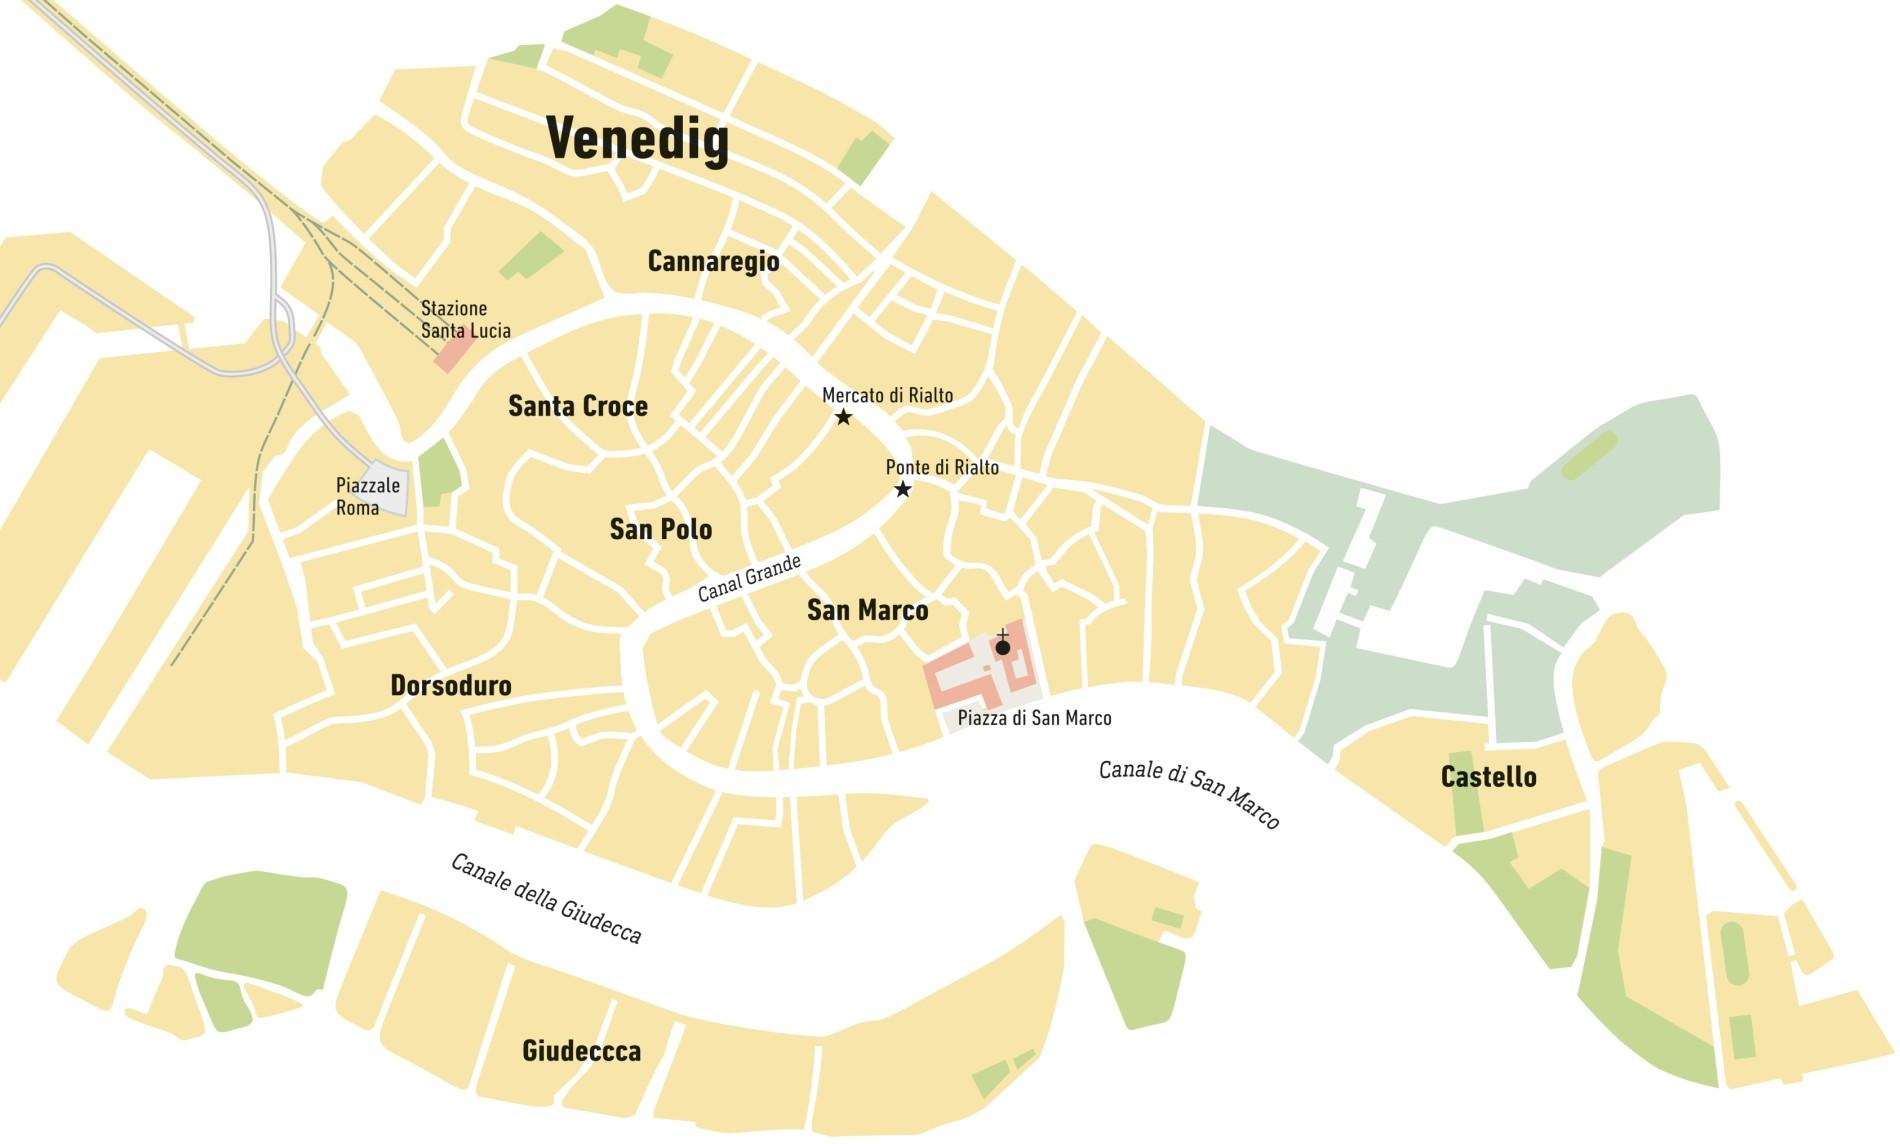 Venedig Karte.Karte Die Besten Happen Von Venedig